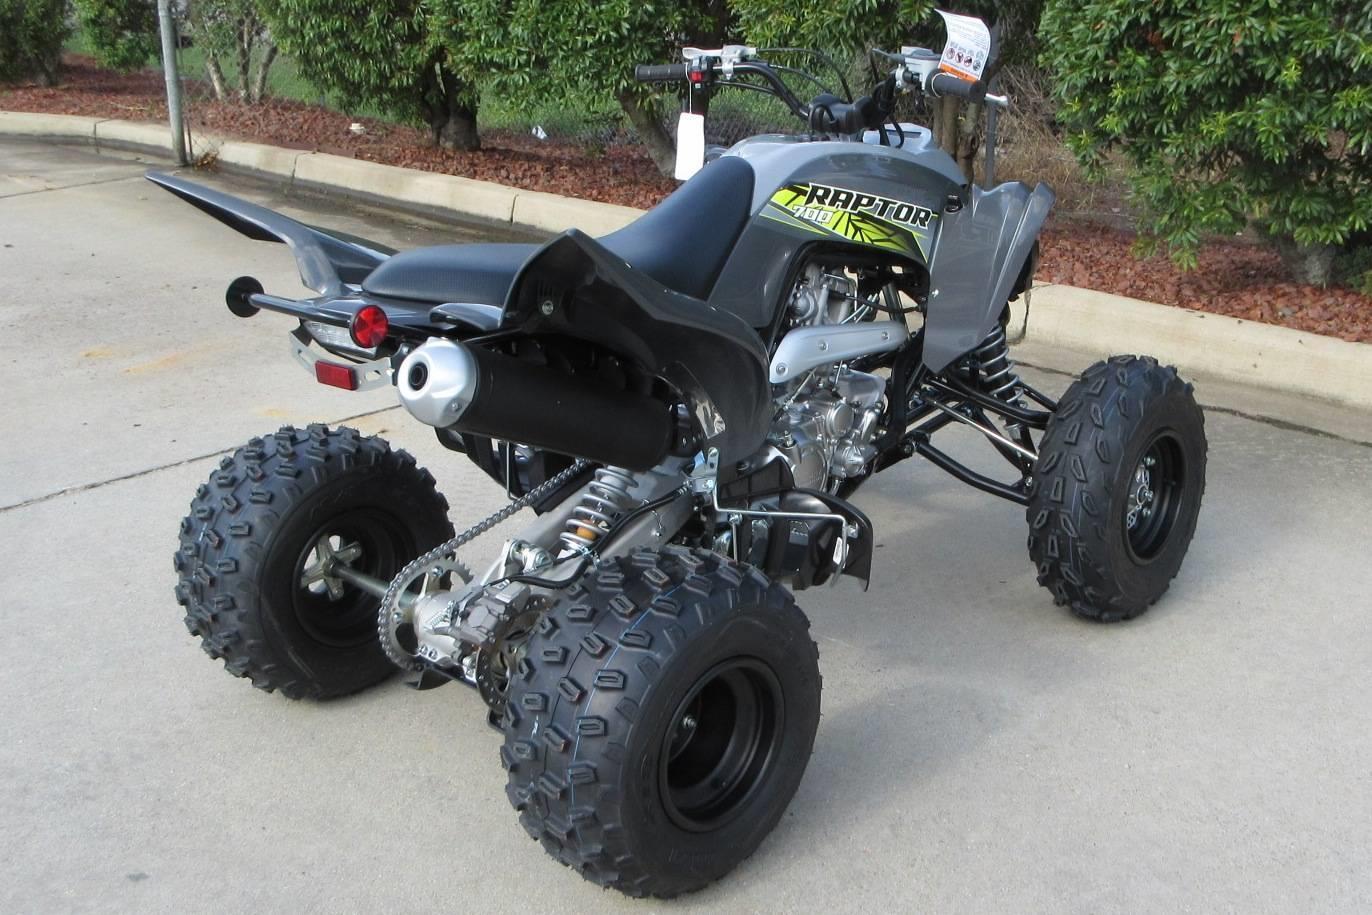 Factory Cheap Price Raptor 700 ATV 6